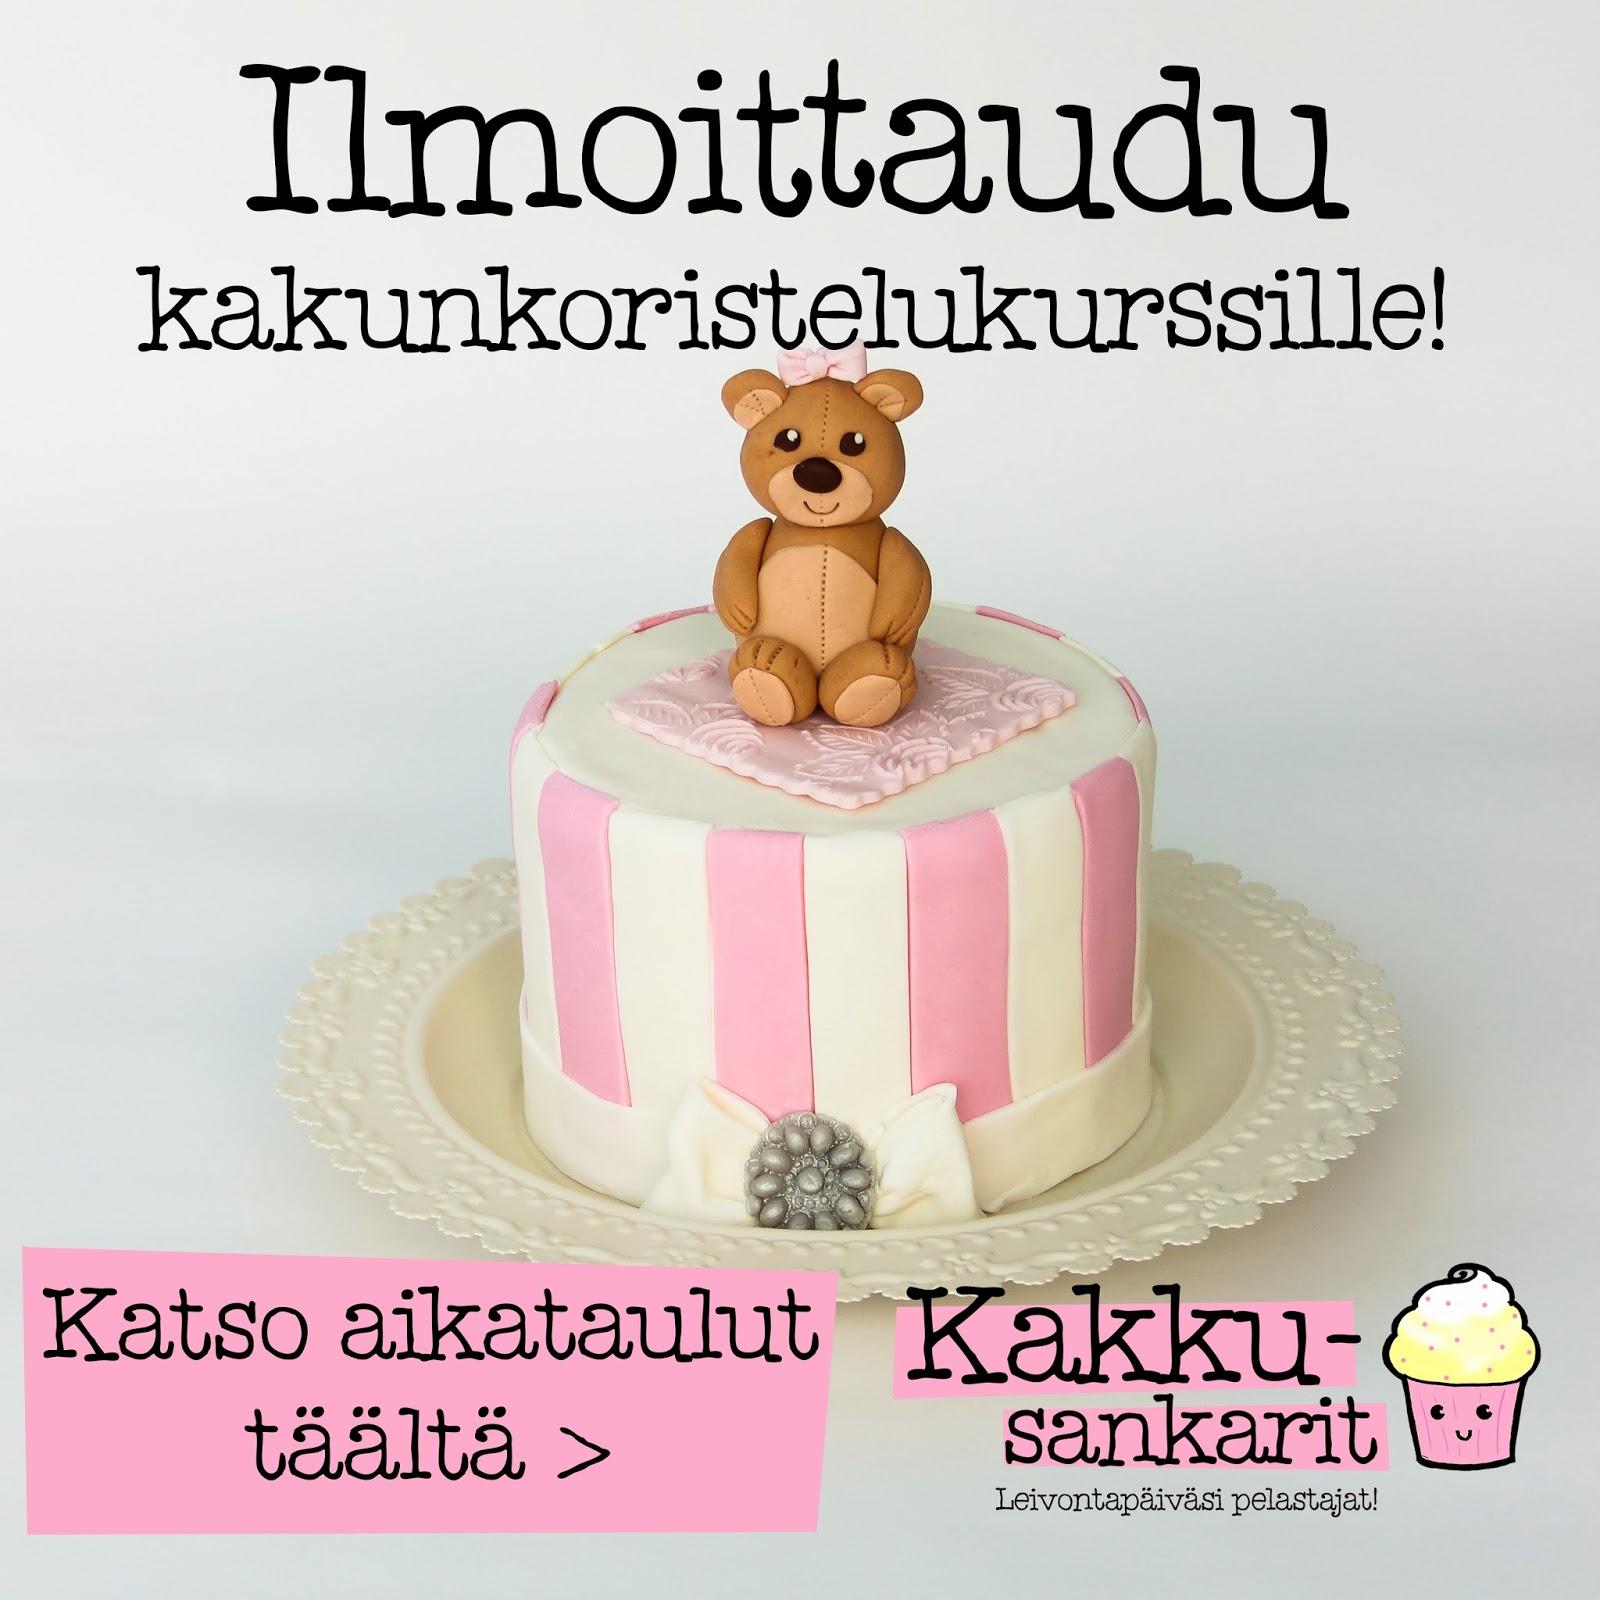 http://www.kakkusankarit.fi/Kurssit